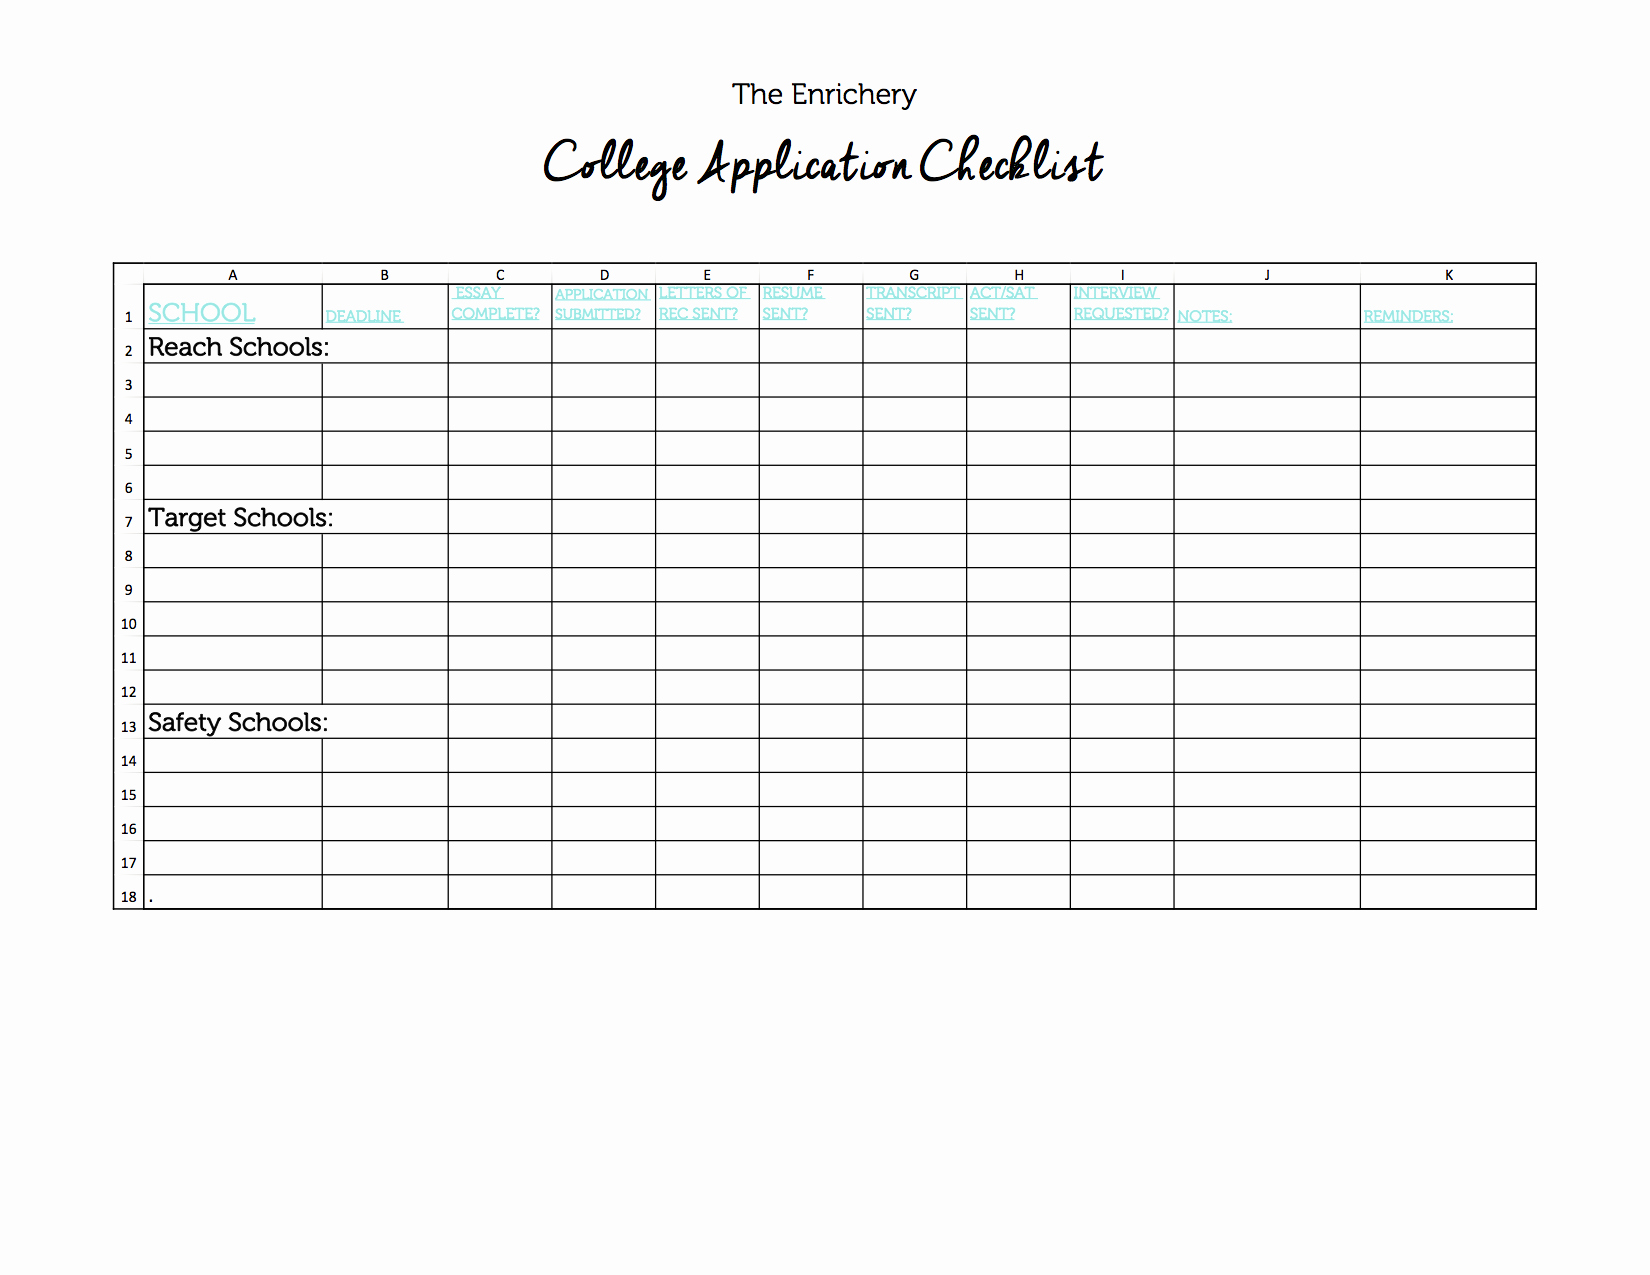 College Application Checklist Template Elegant Blank College Application Checklist the Enrichery